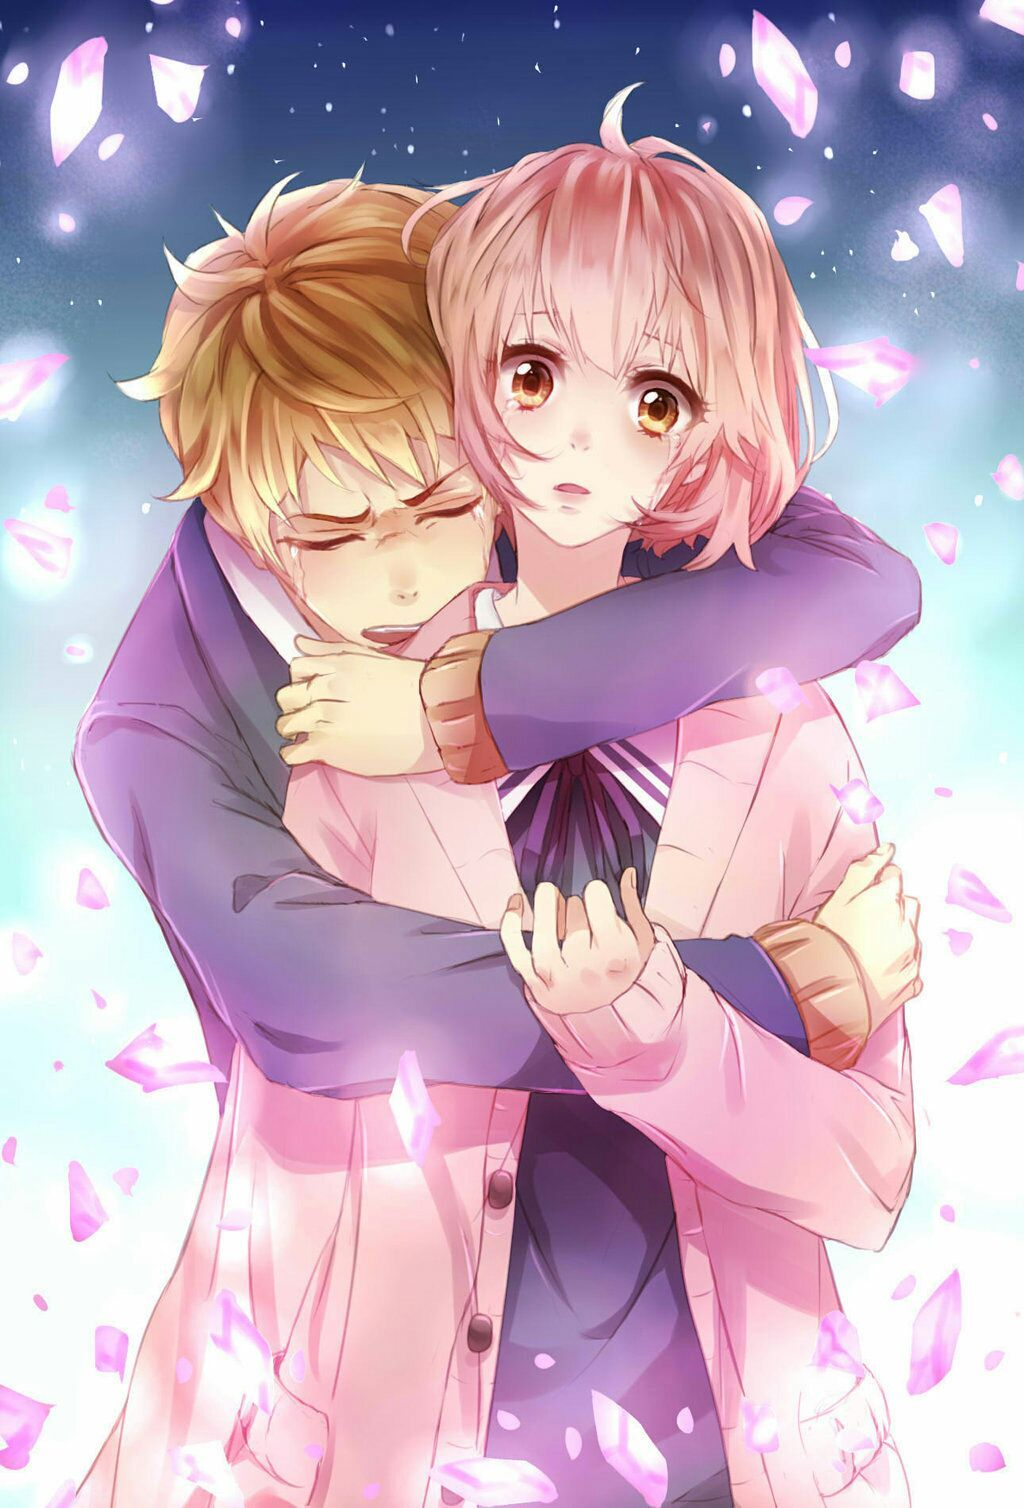 Wallpaper dan Gambar Anime | Manga anime, Anime sedih ...